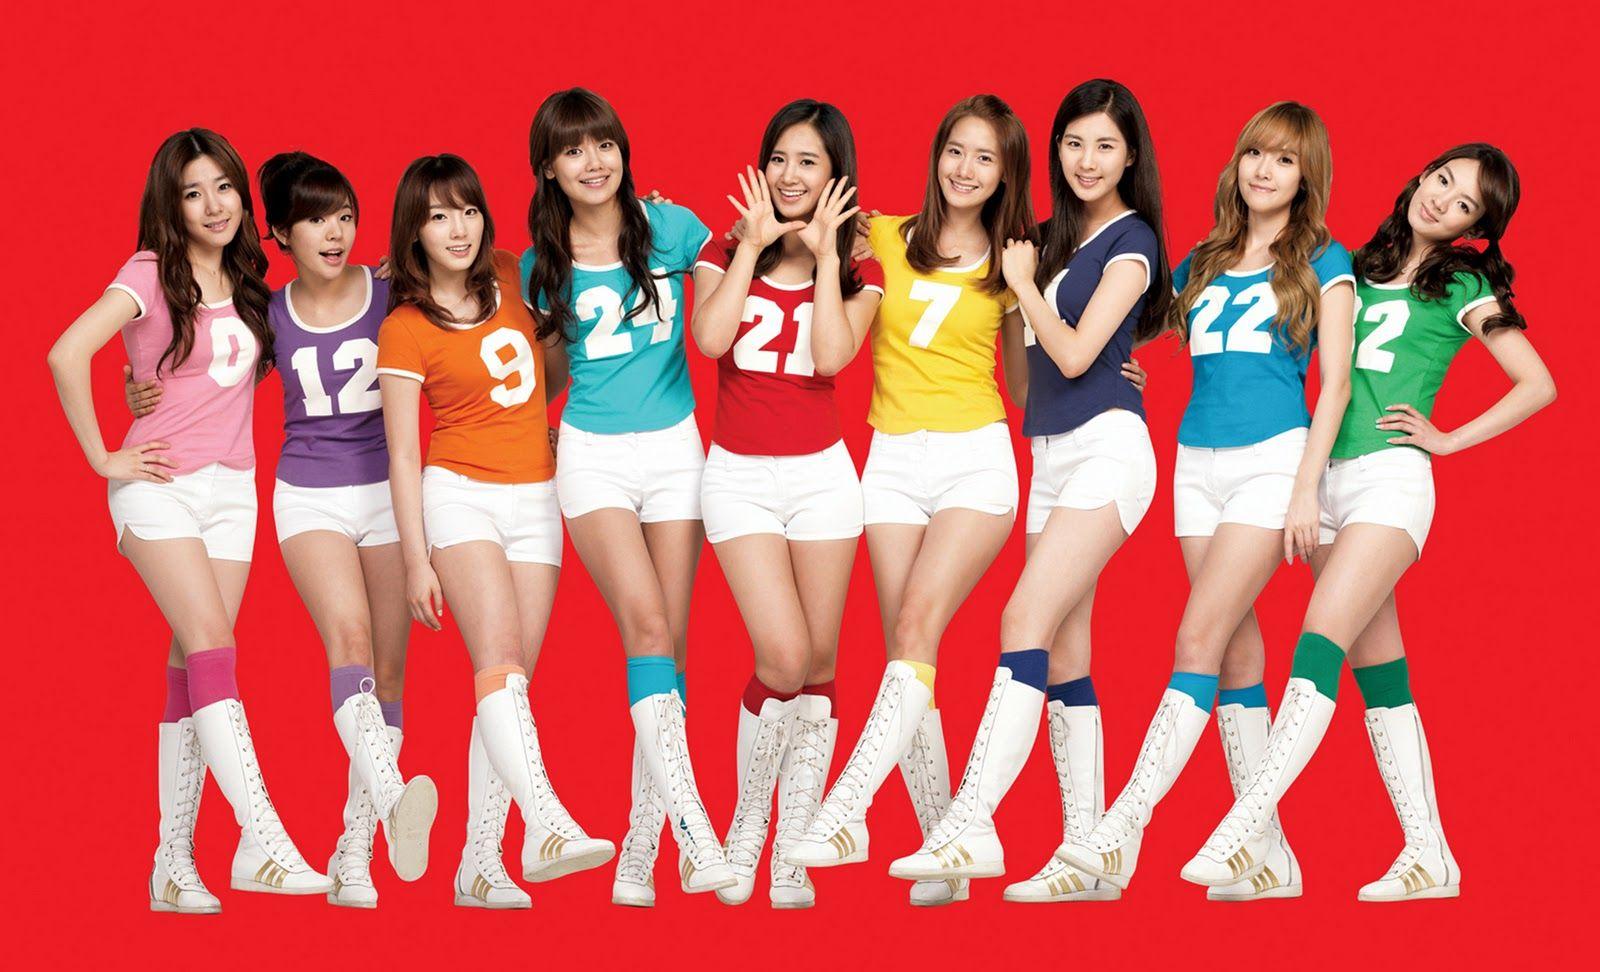 girls generation members wallpaper Yoonimallow HAssistant 1600x972